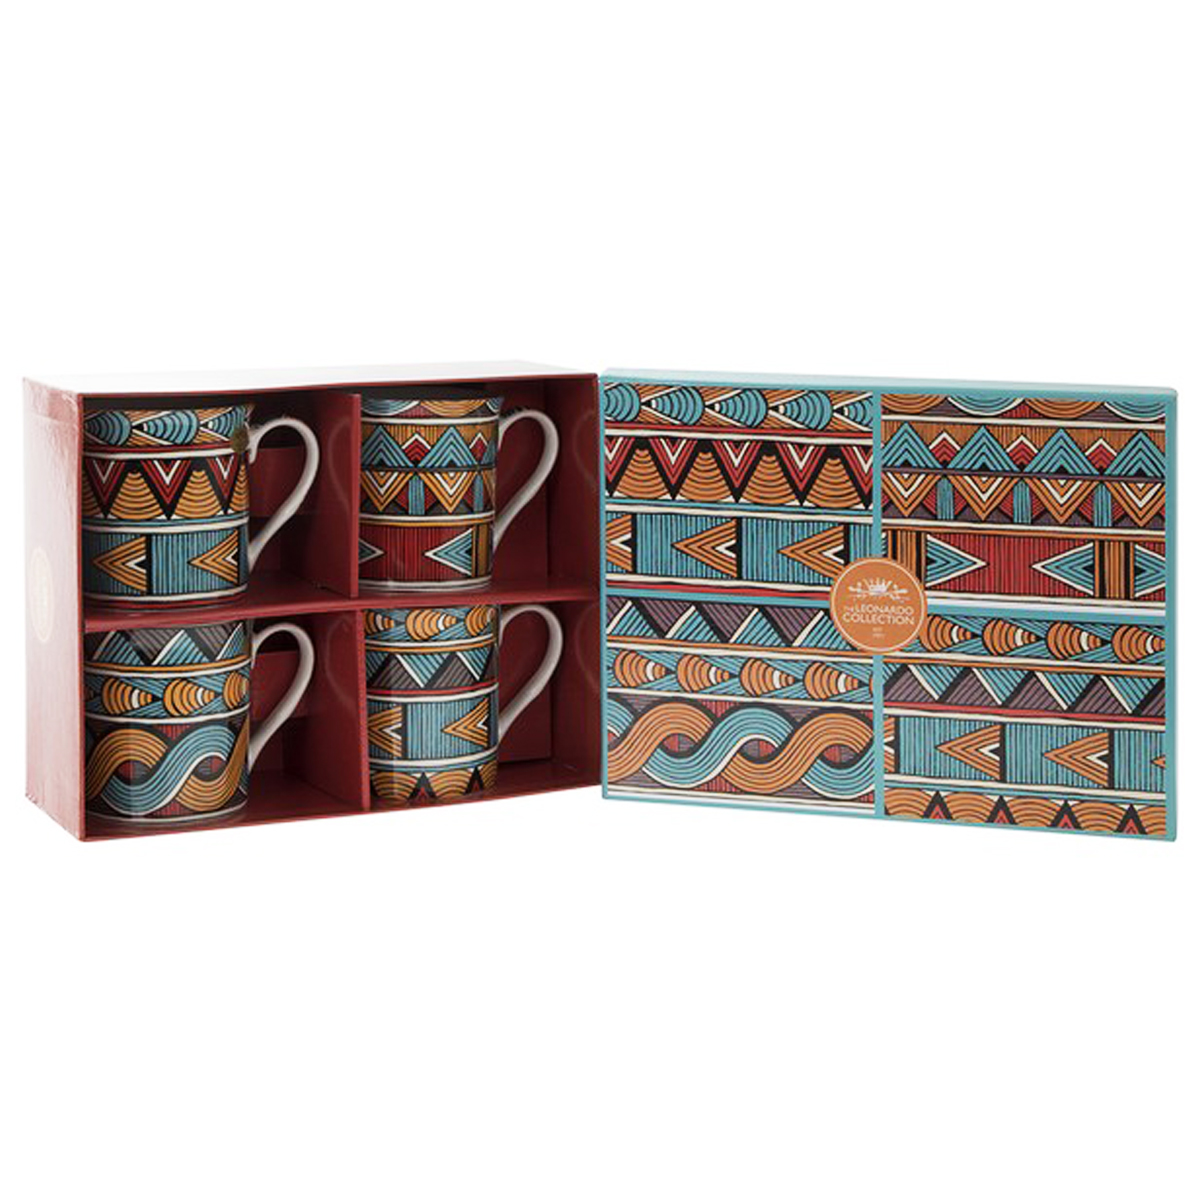 Coffret mugs porcelaine \'Bali\' marron turquoise (4 mugs) - 85x85 mm - [Q1663]